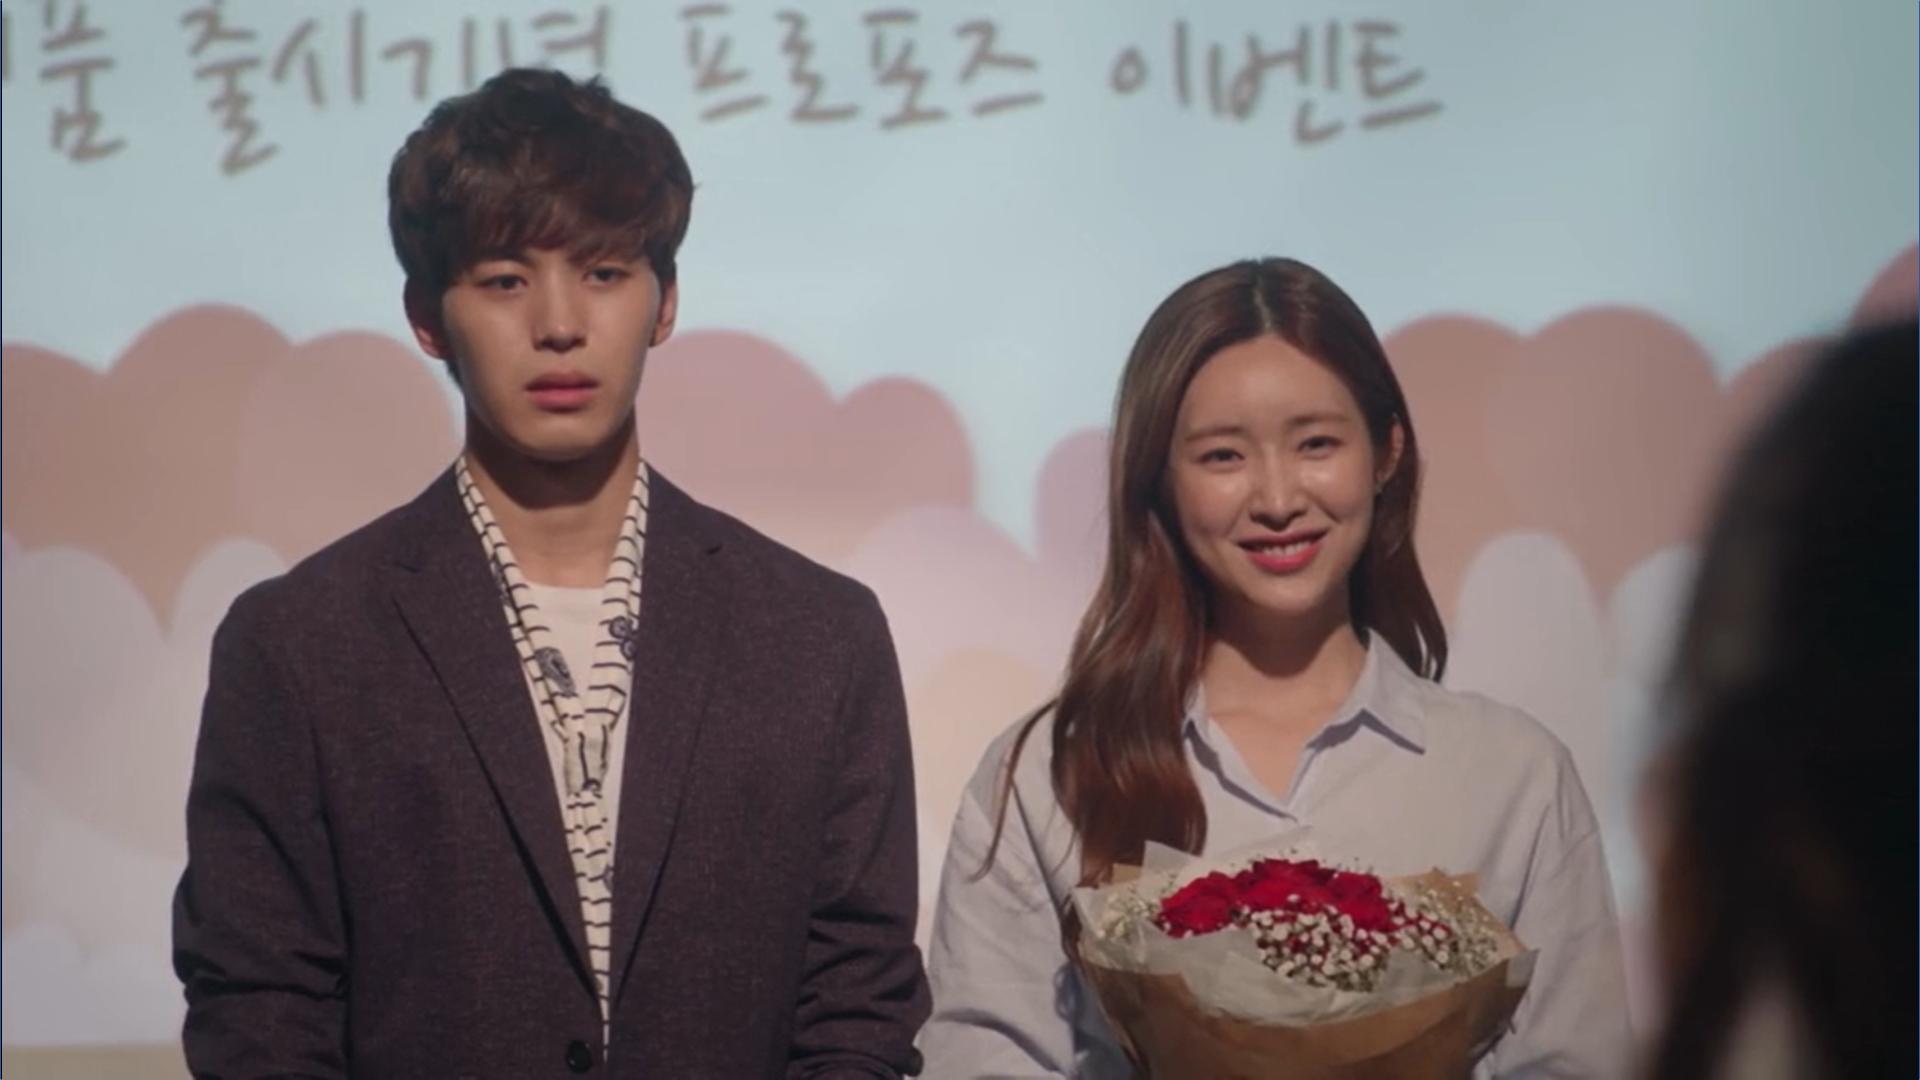 Wednesday 3:30 PM Yoon Jae-won and Gong Na-yeon at proposal